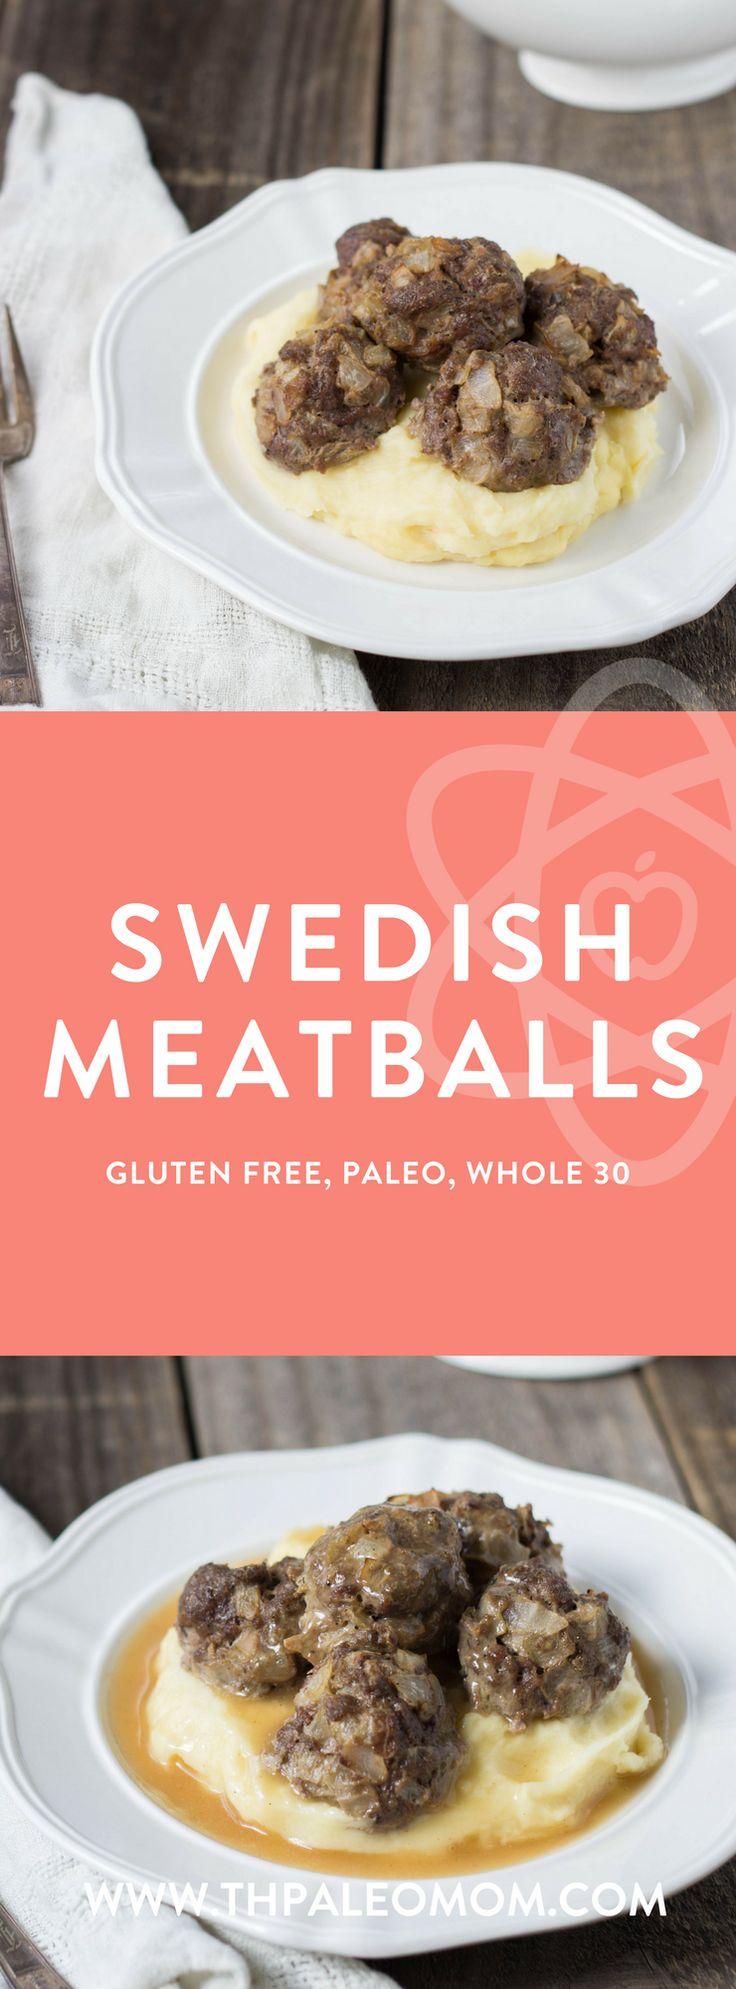 Swedish Meatballs | The Paleo Mom (Whole 30 friendly)